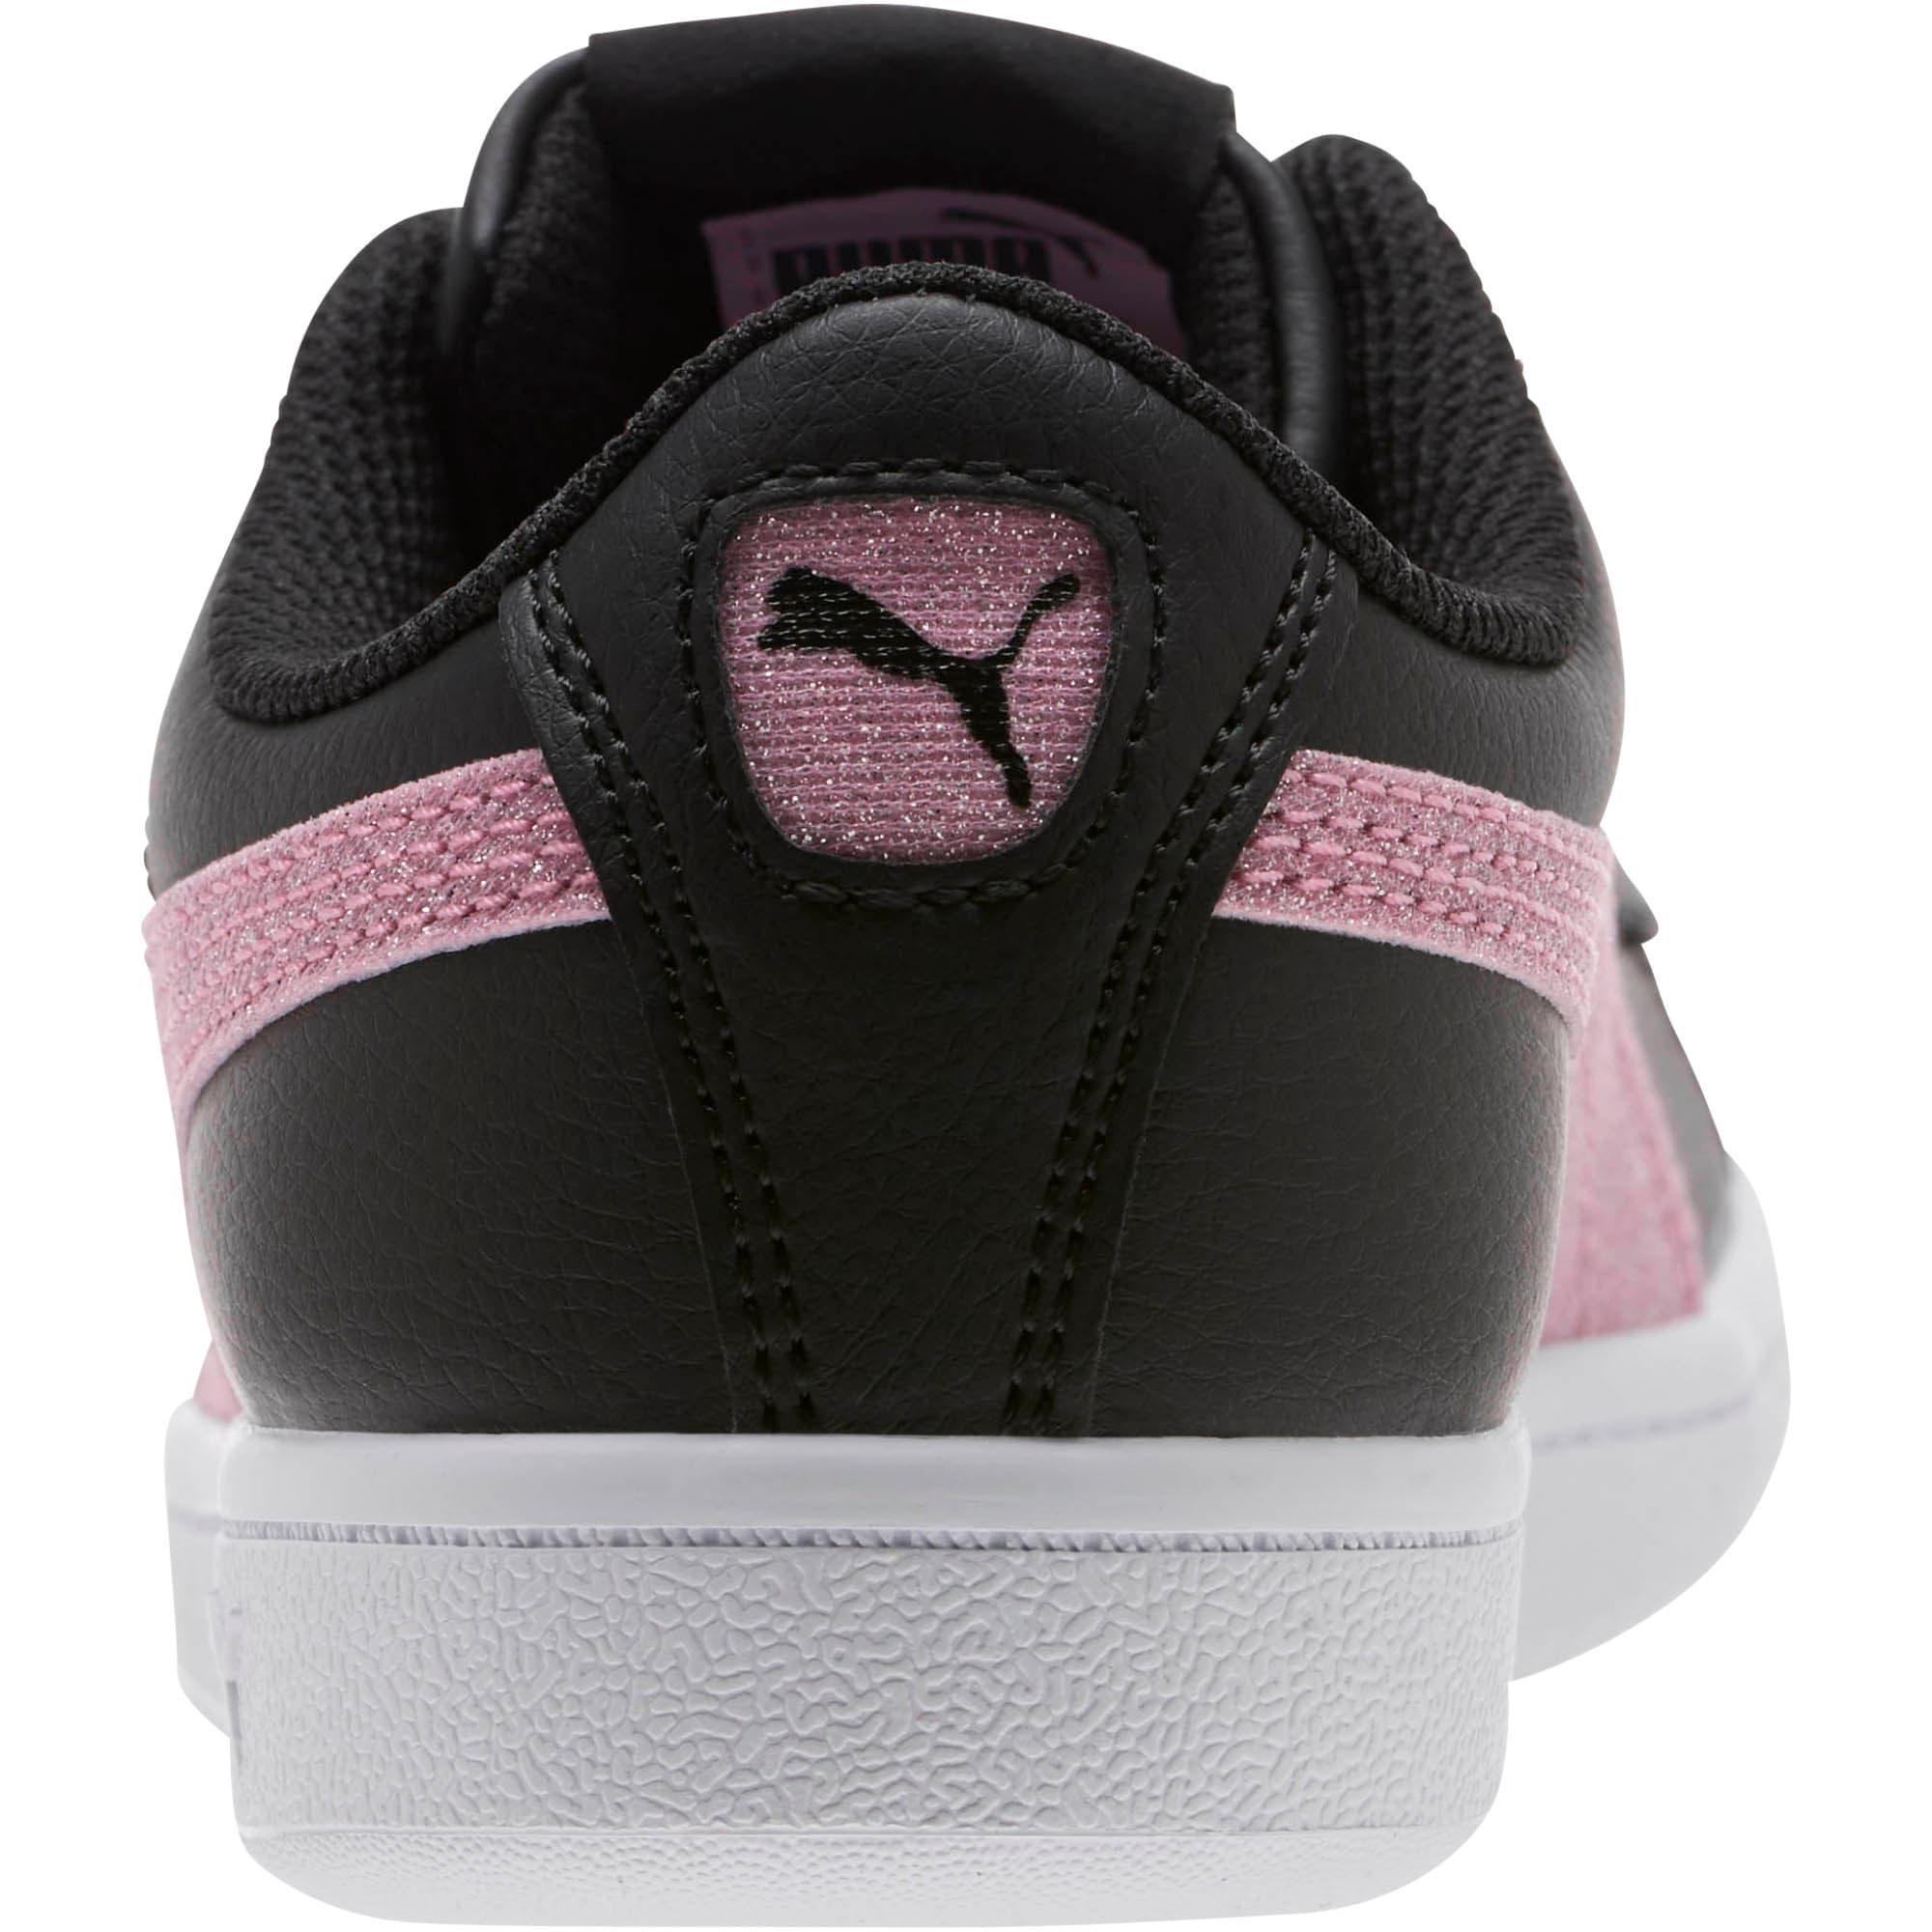 Thumbnail 4 of Puma Vikky Glitz FS Sneakers JR, Black-Orchid-Silver, medium